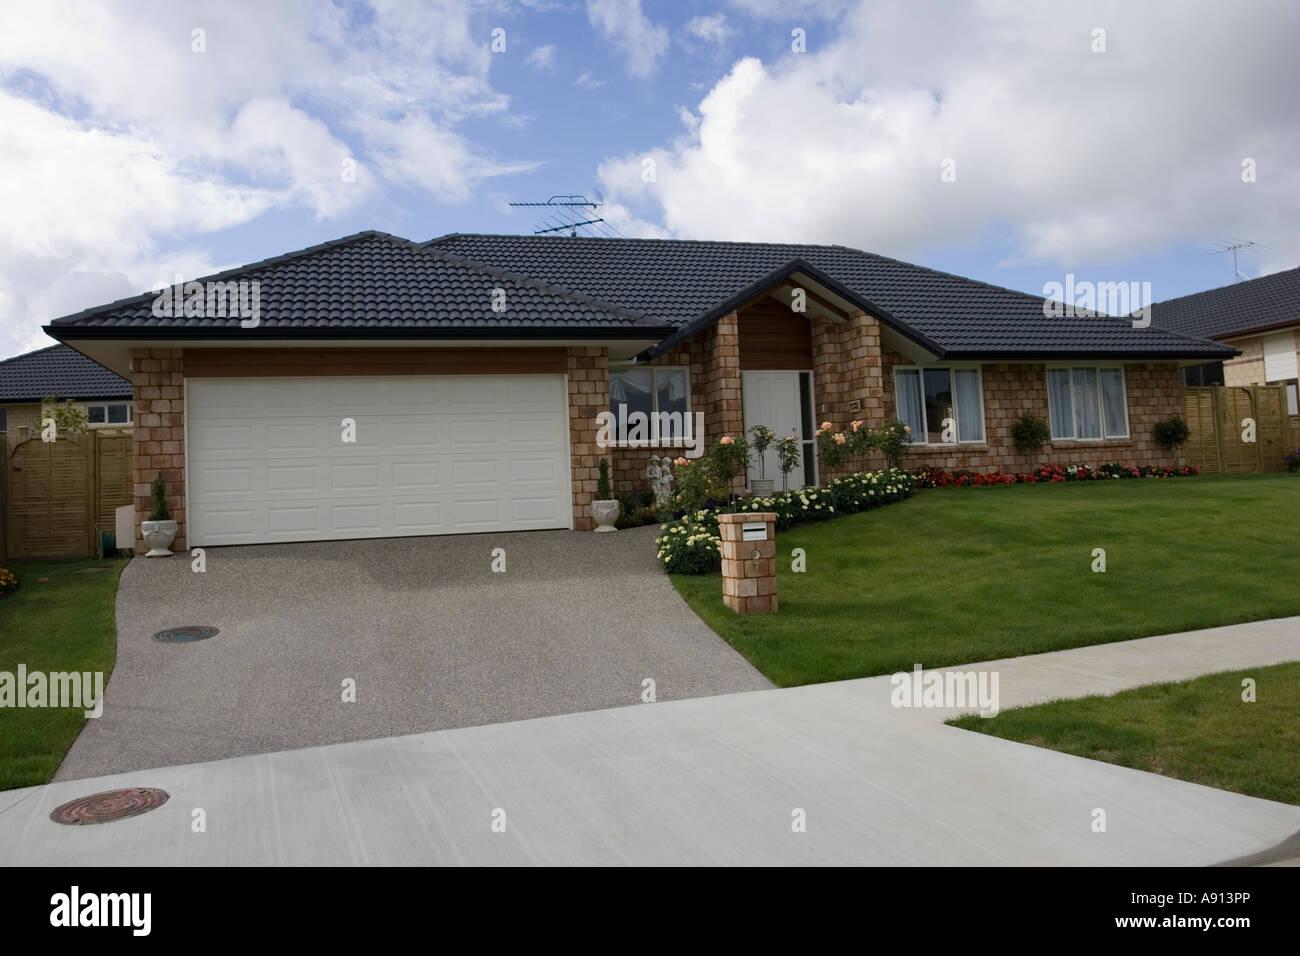 modern gebaut vor kurzem s bungalow auckland nordinsel neuseeland stockfoto bild 12215997 alamy. Black Bedroom Furniture Sets. Home Design Ideas